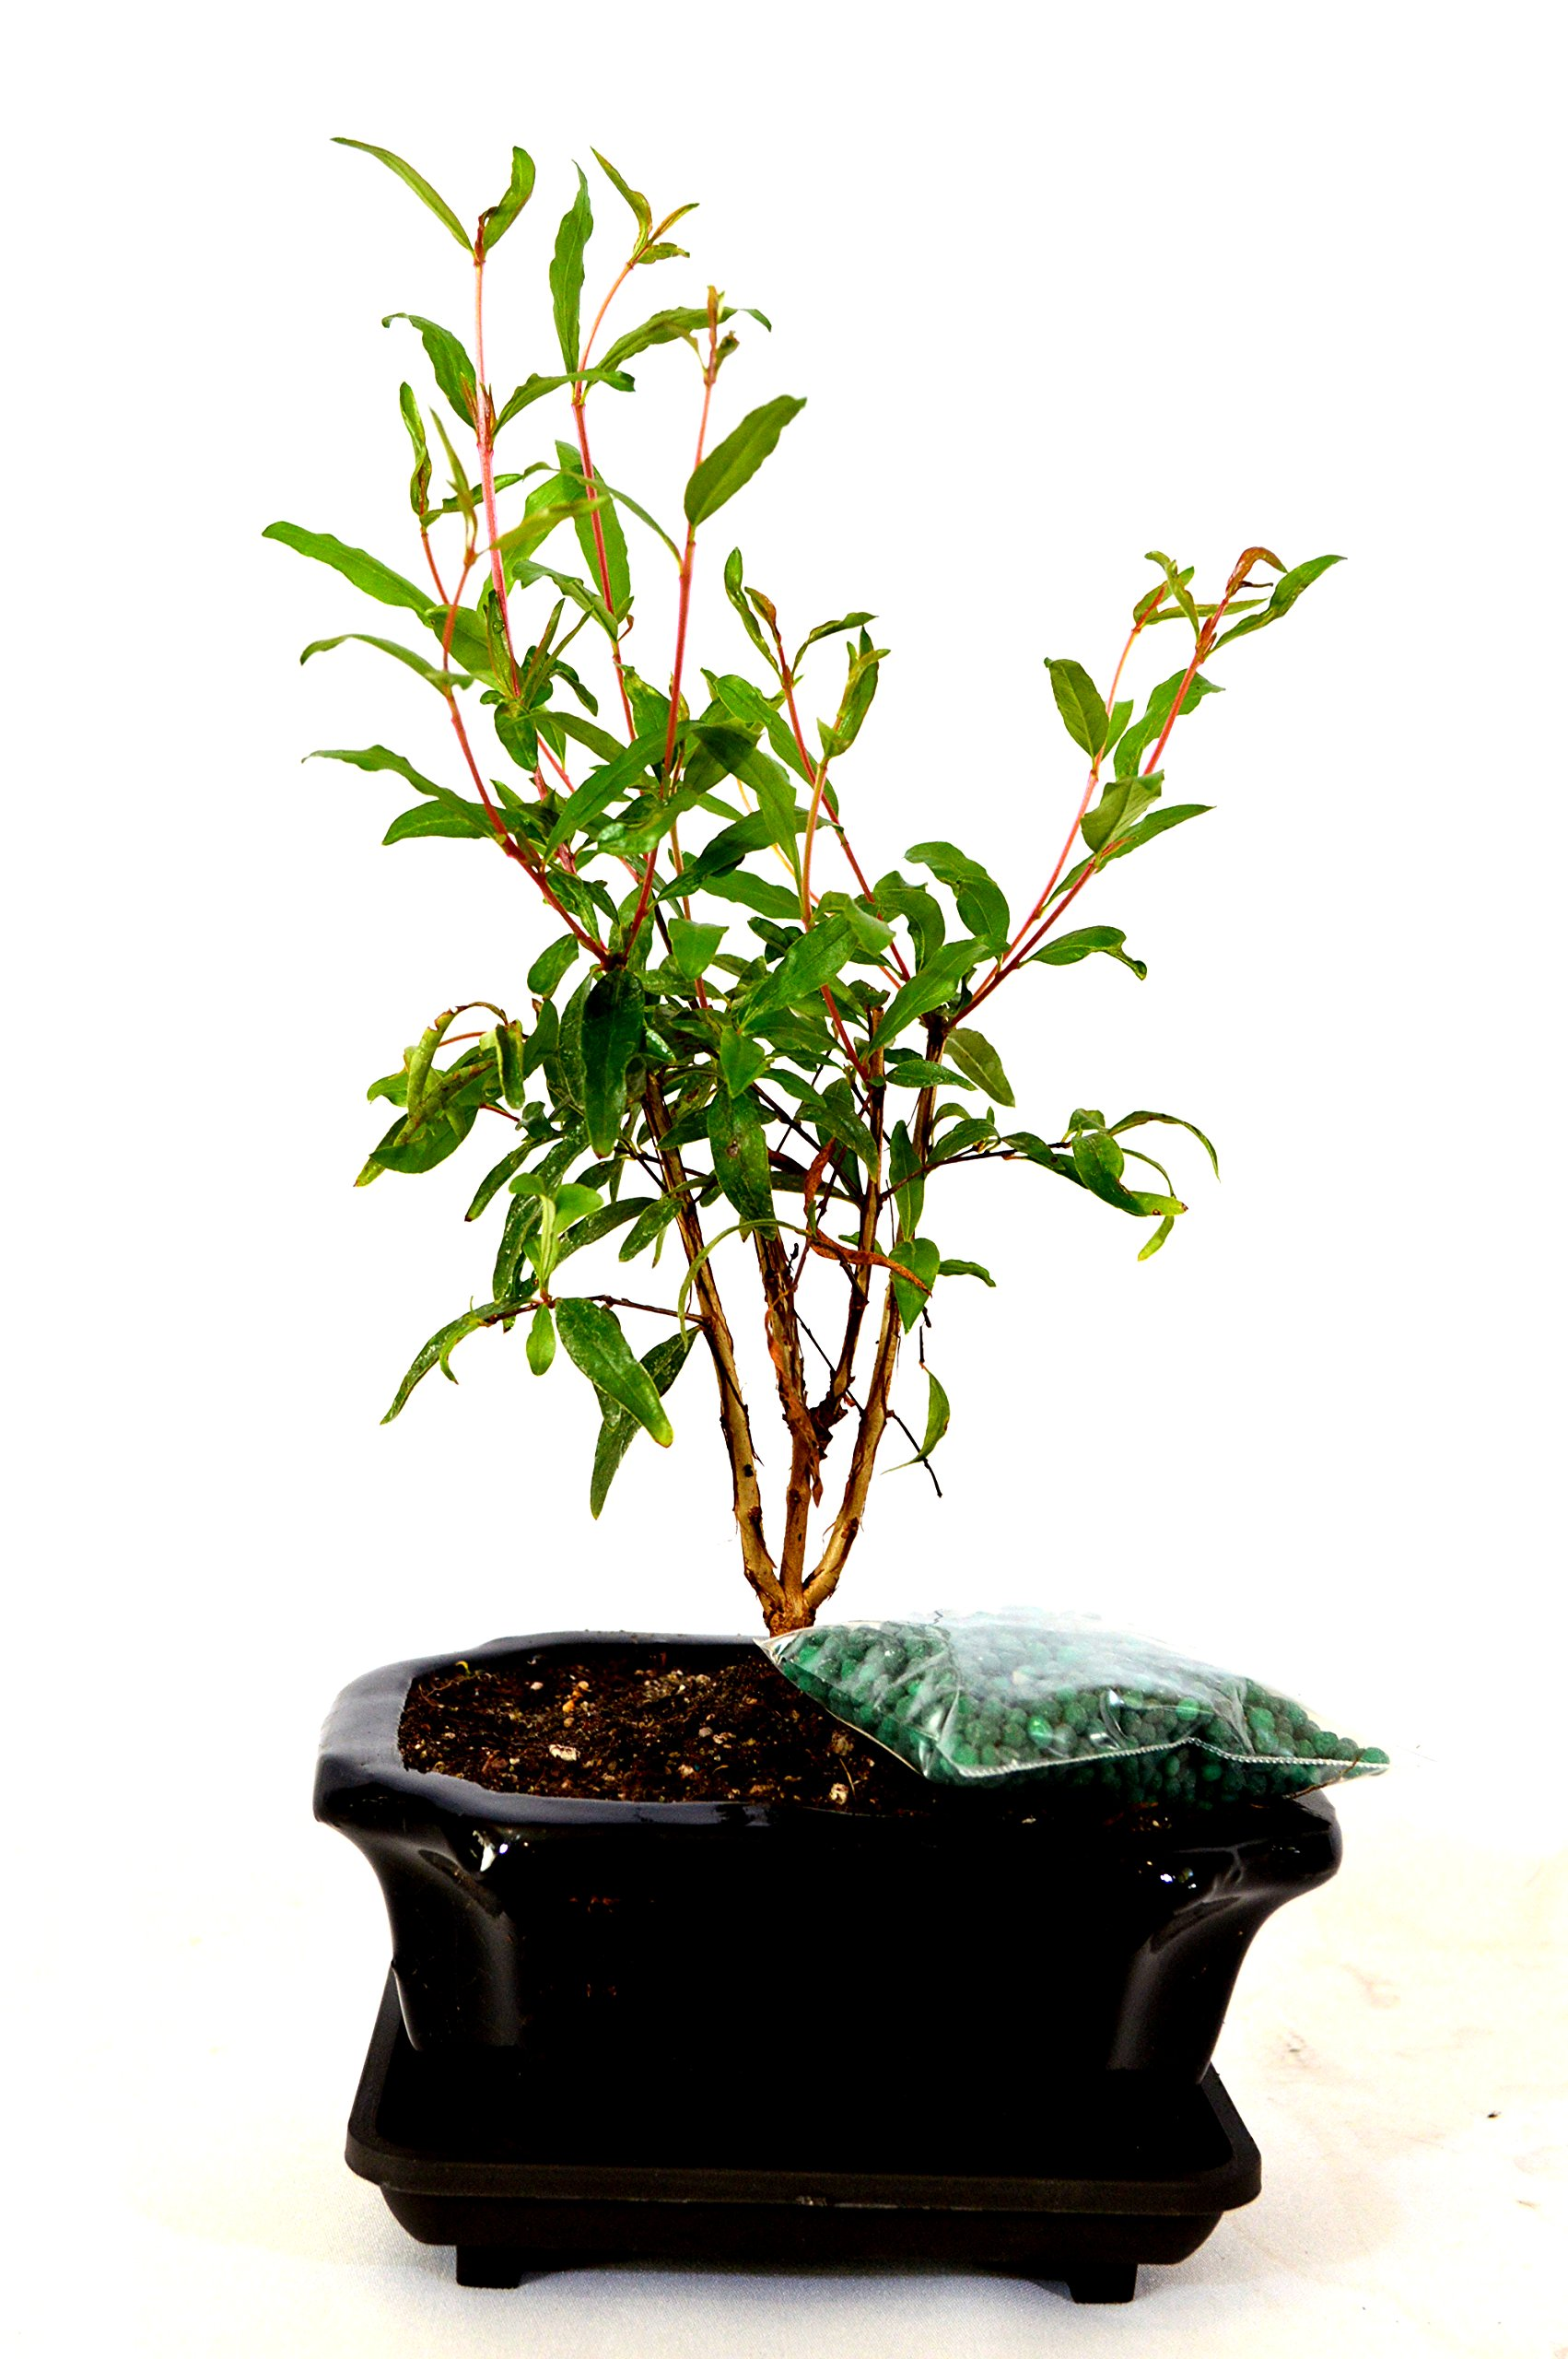 9GreenBox - Dwarf Pomegranate Mame Bonsai with Ceramic Pot